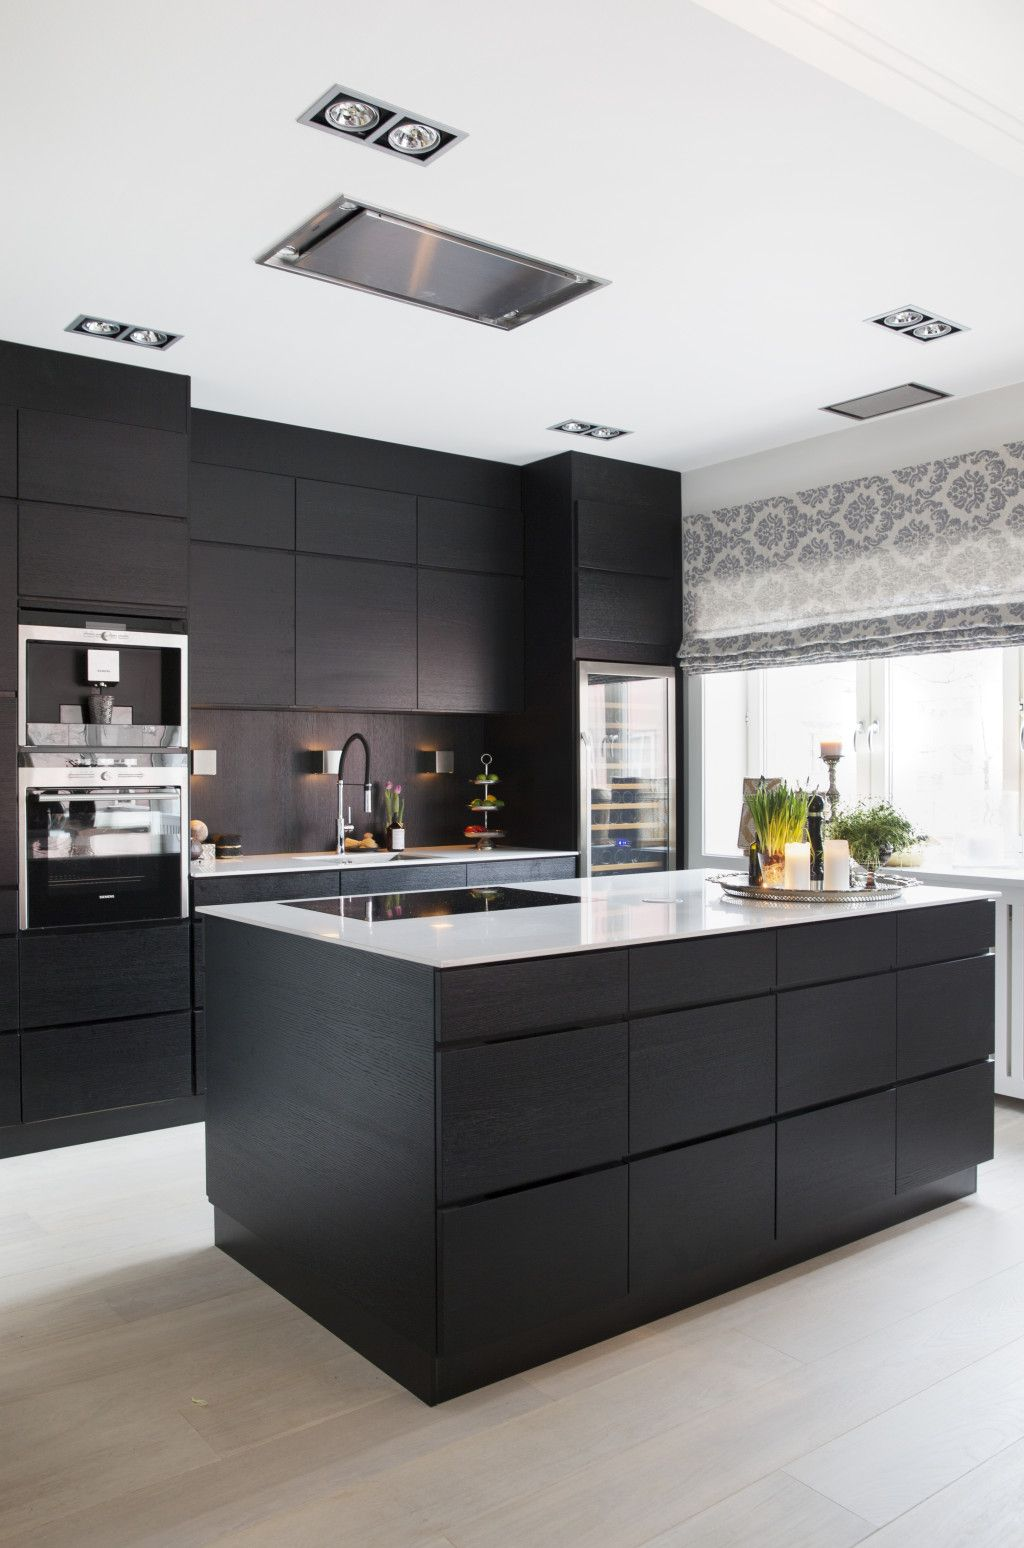 mondo interi r leilighet p frogner kitchen k chen dining esszimmer pantry storage. Black Bedroom Furniture Sets. Home Design Ideas